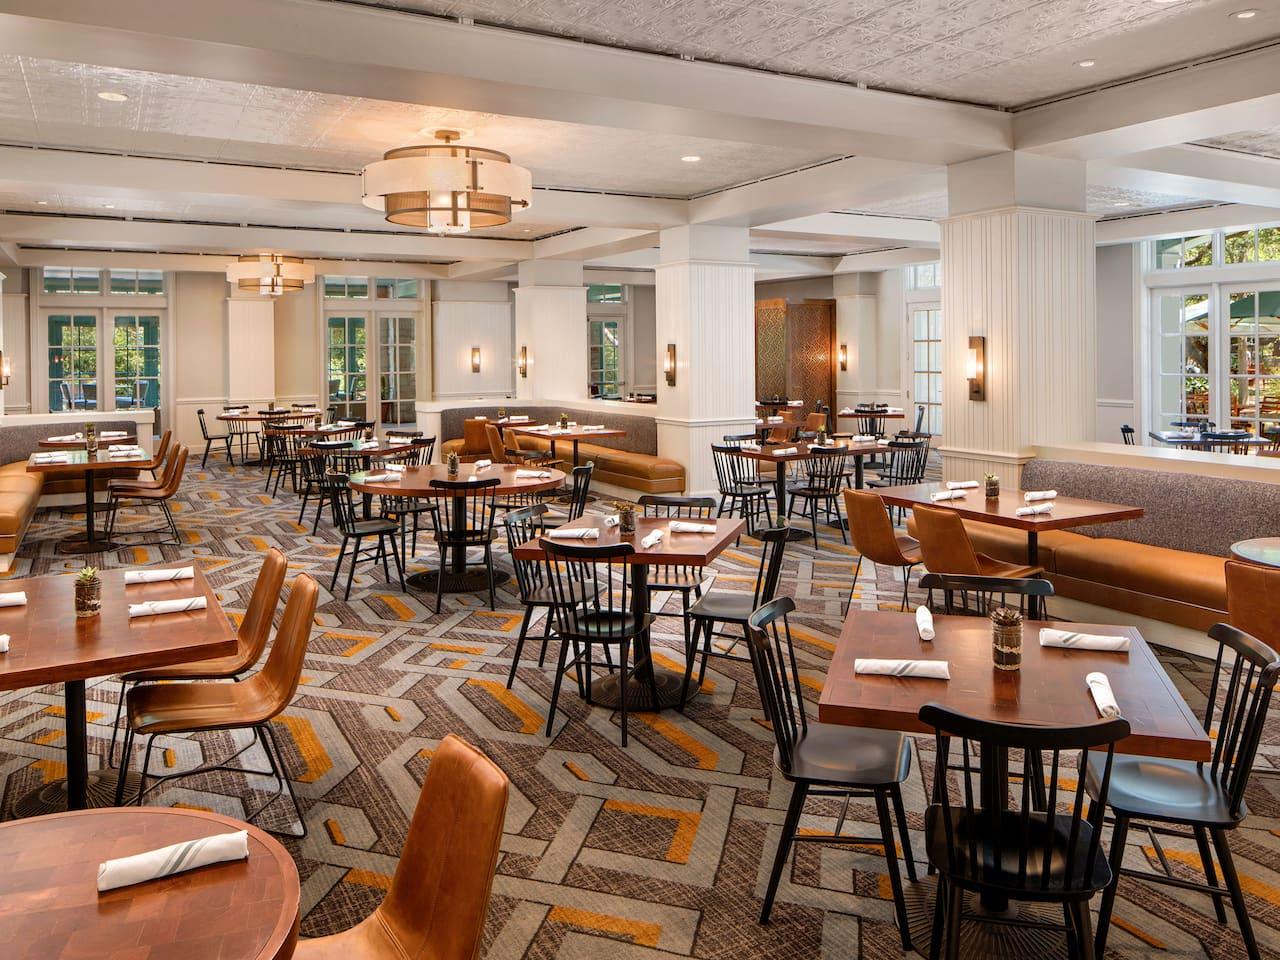 Springhouse Cafe Hyatt Regency Hill Country Resort & Spa